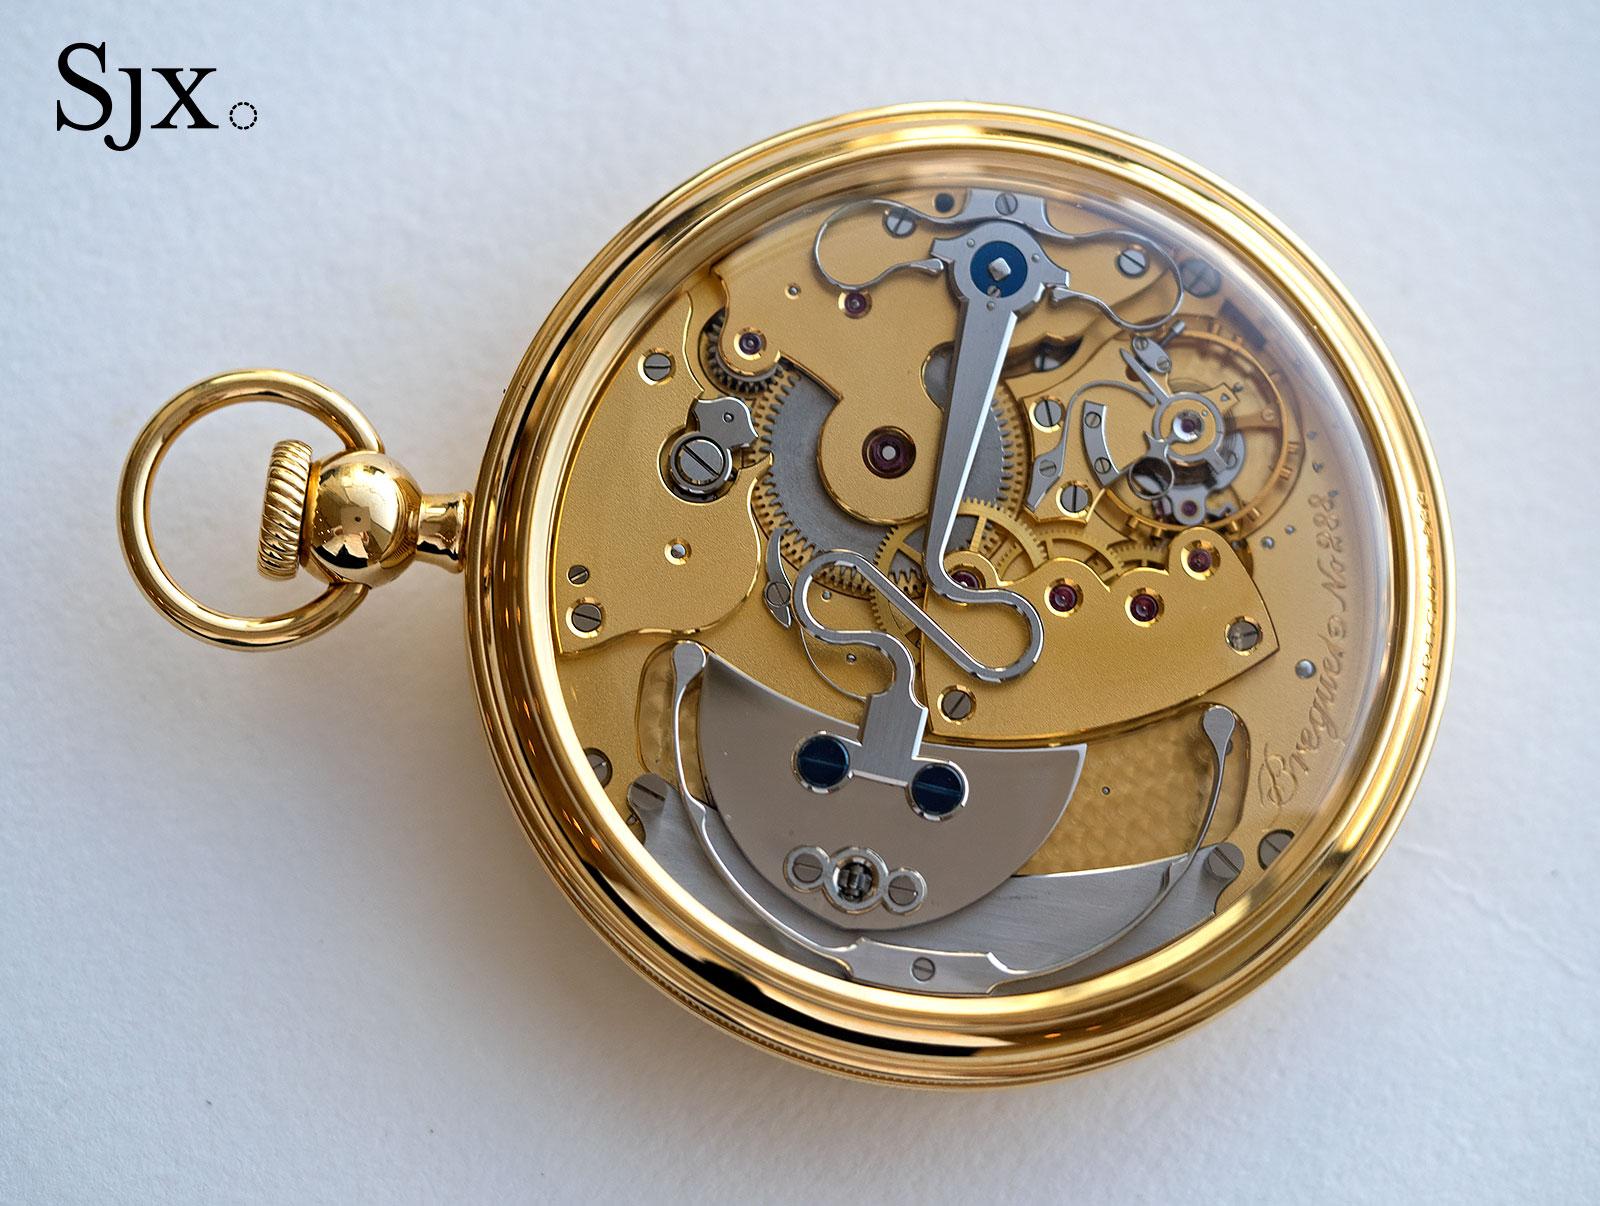 Breguet Souscription set pocket watch 1